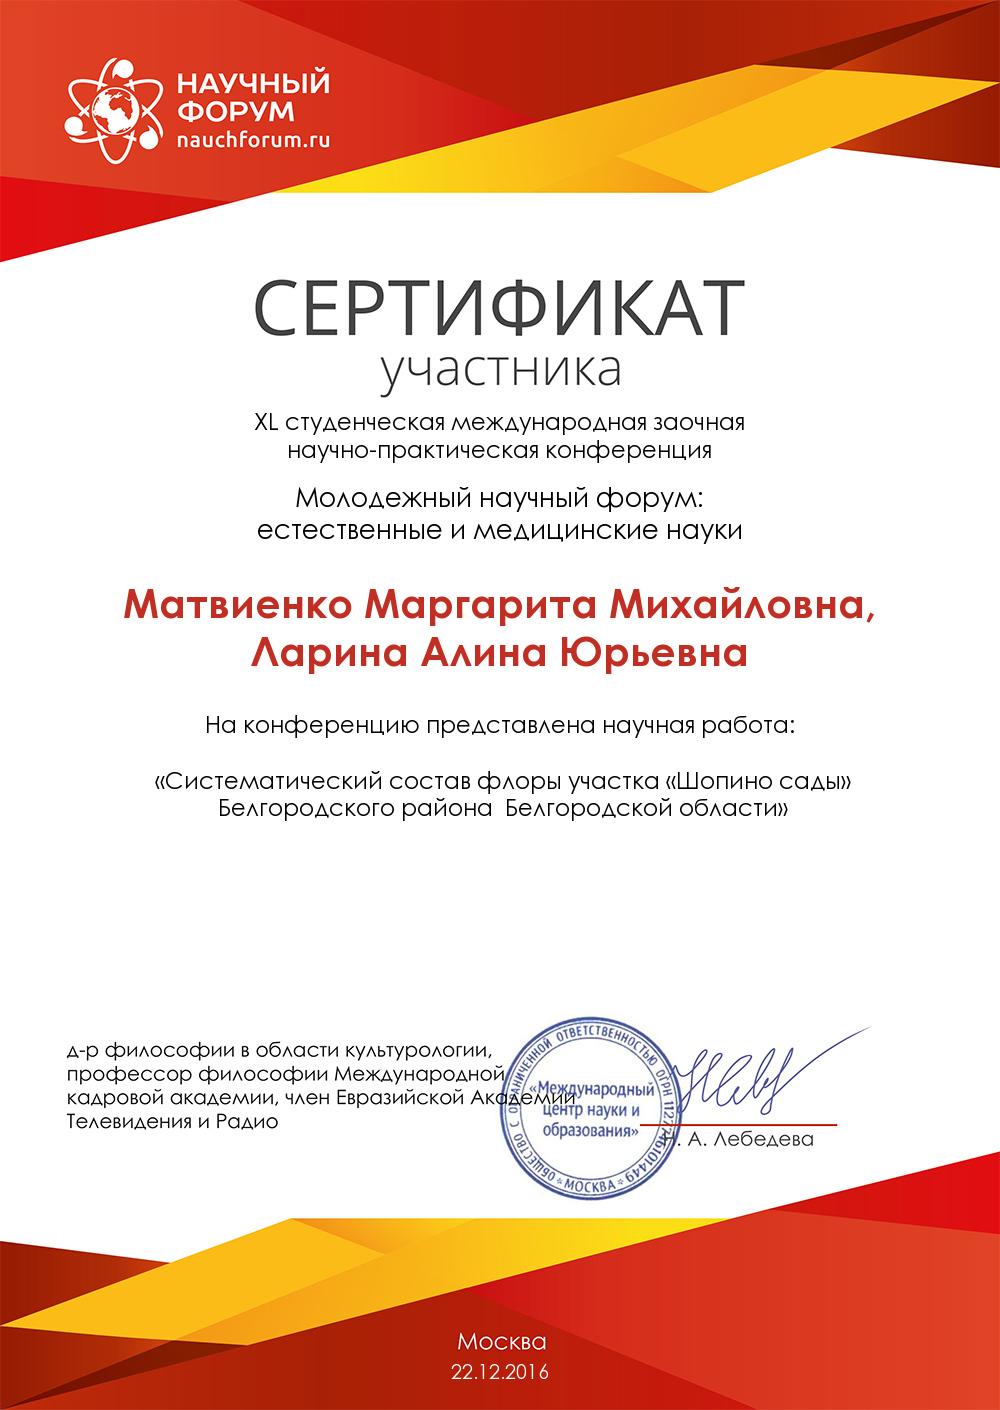 Сертификат участника конференции Матвиенко Маргарита Михайловна nauchforum.ru